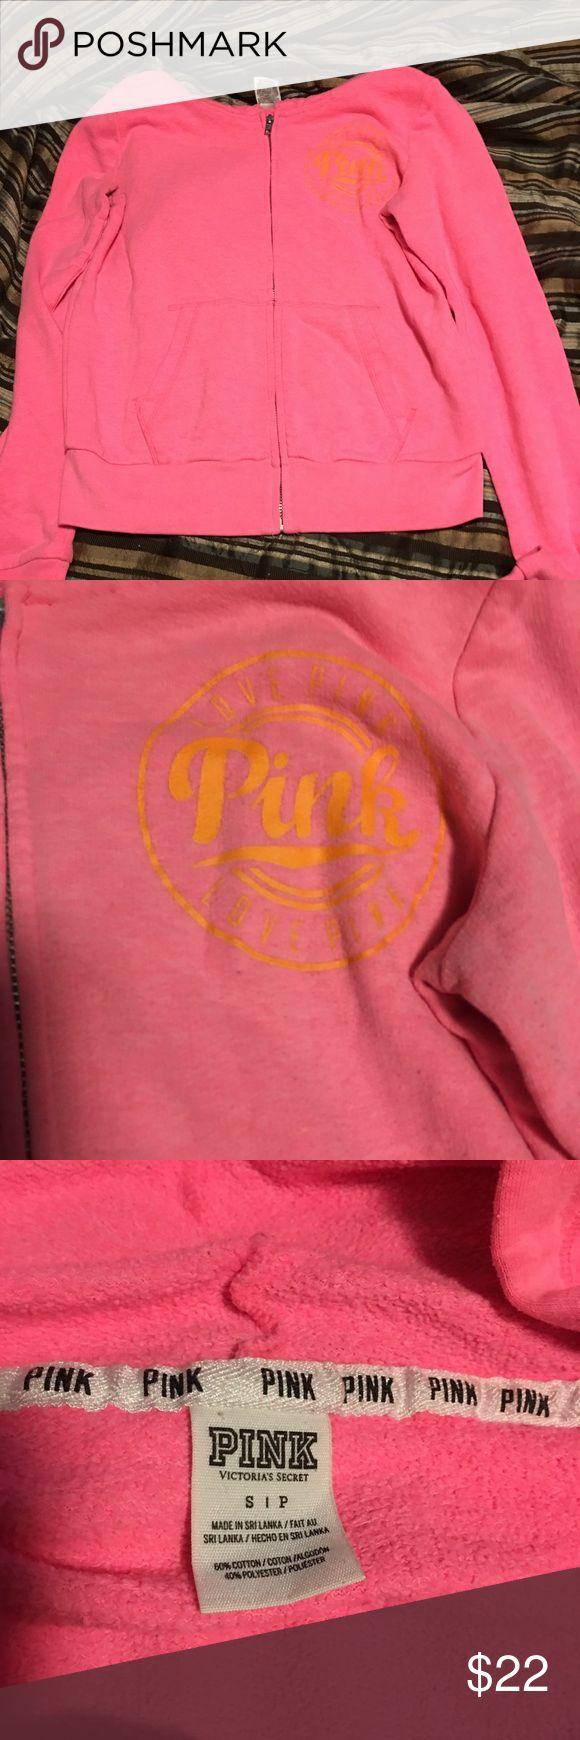 Victoria Secret pink zip up hoodie with pockets Pink zip up hoodie with pockets. In gently used condition. Size small...Smoke free home PINK Tops Sweatshirts & Hoodies